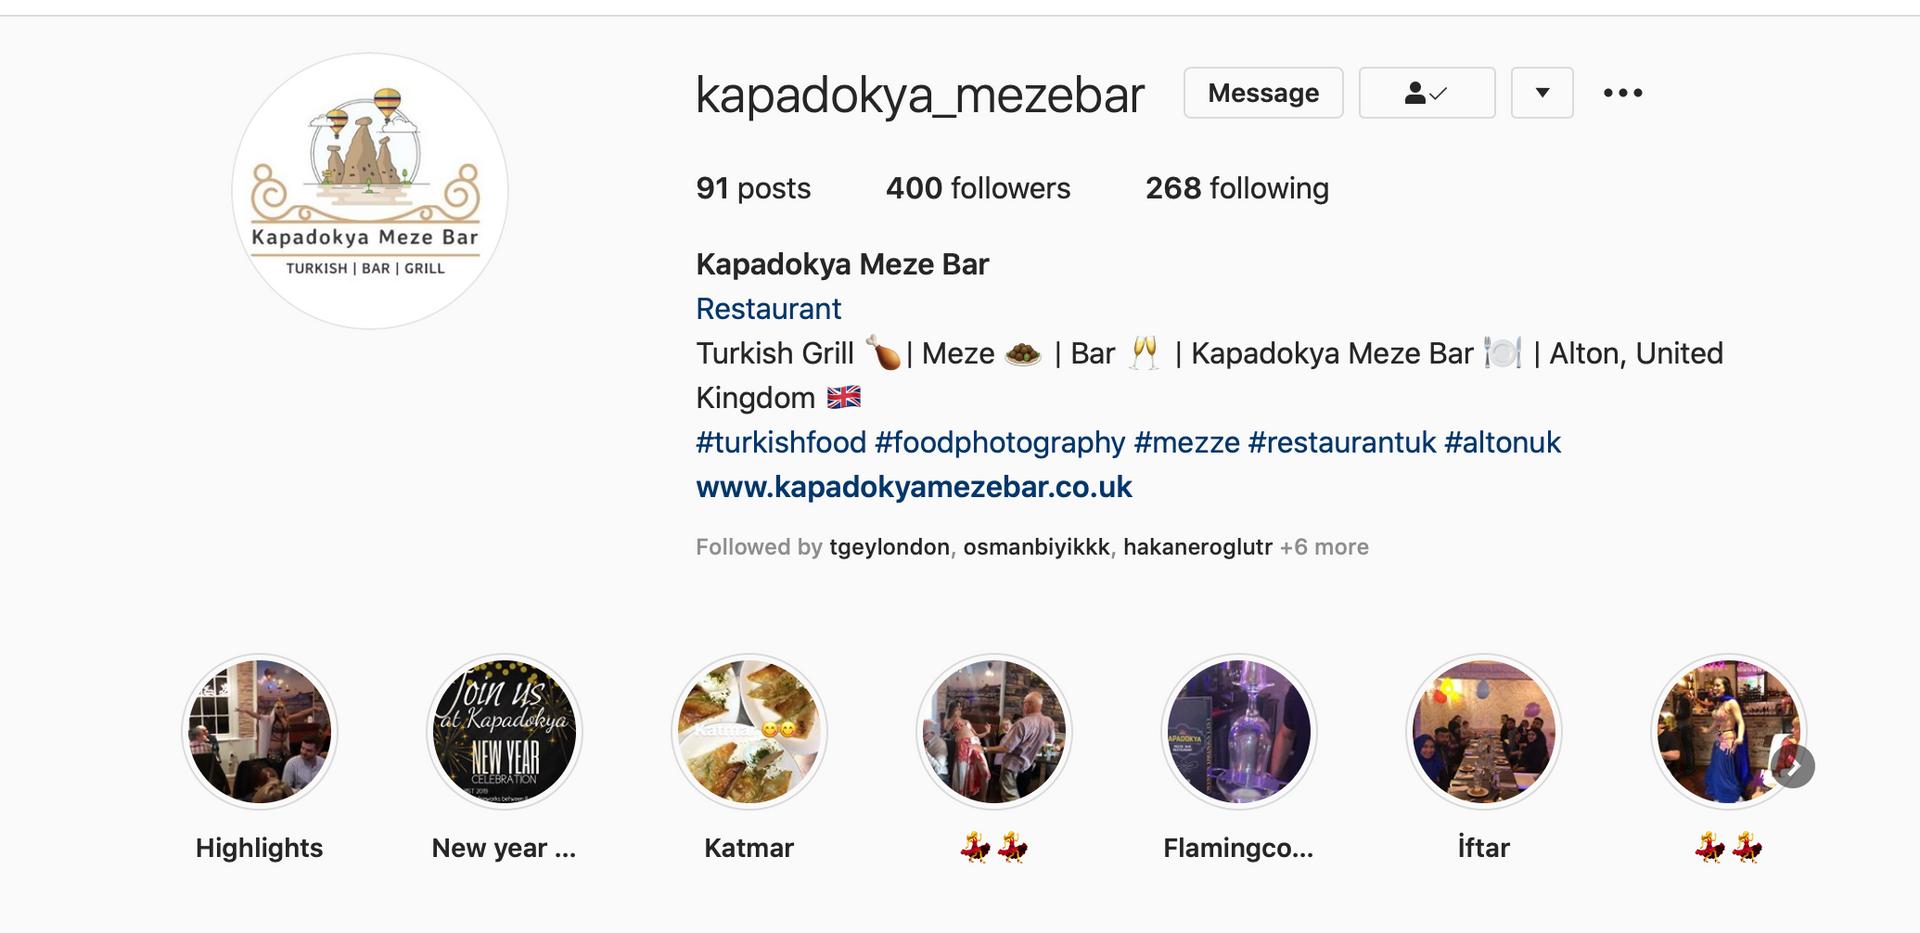 Kapadokya Meze Bar